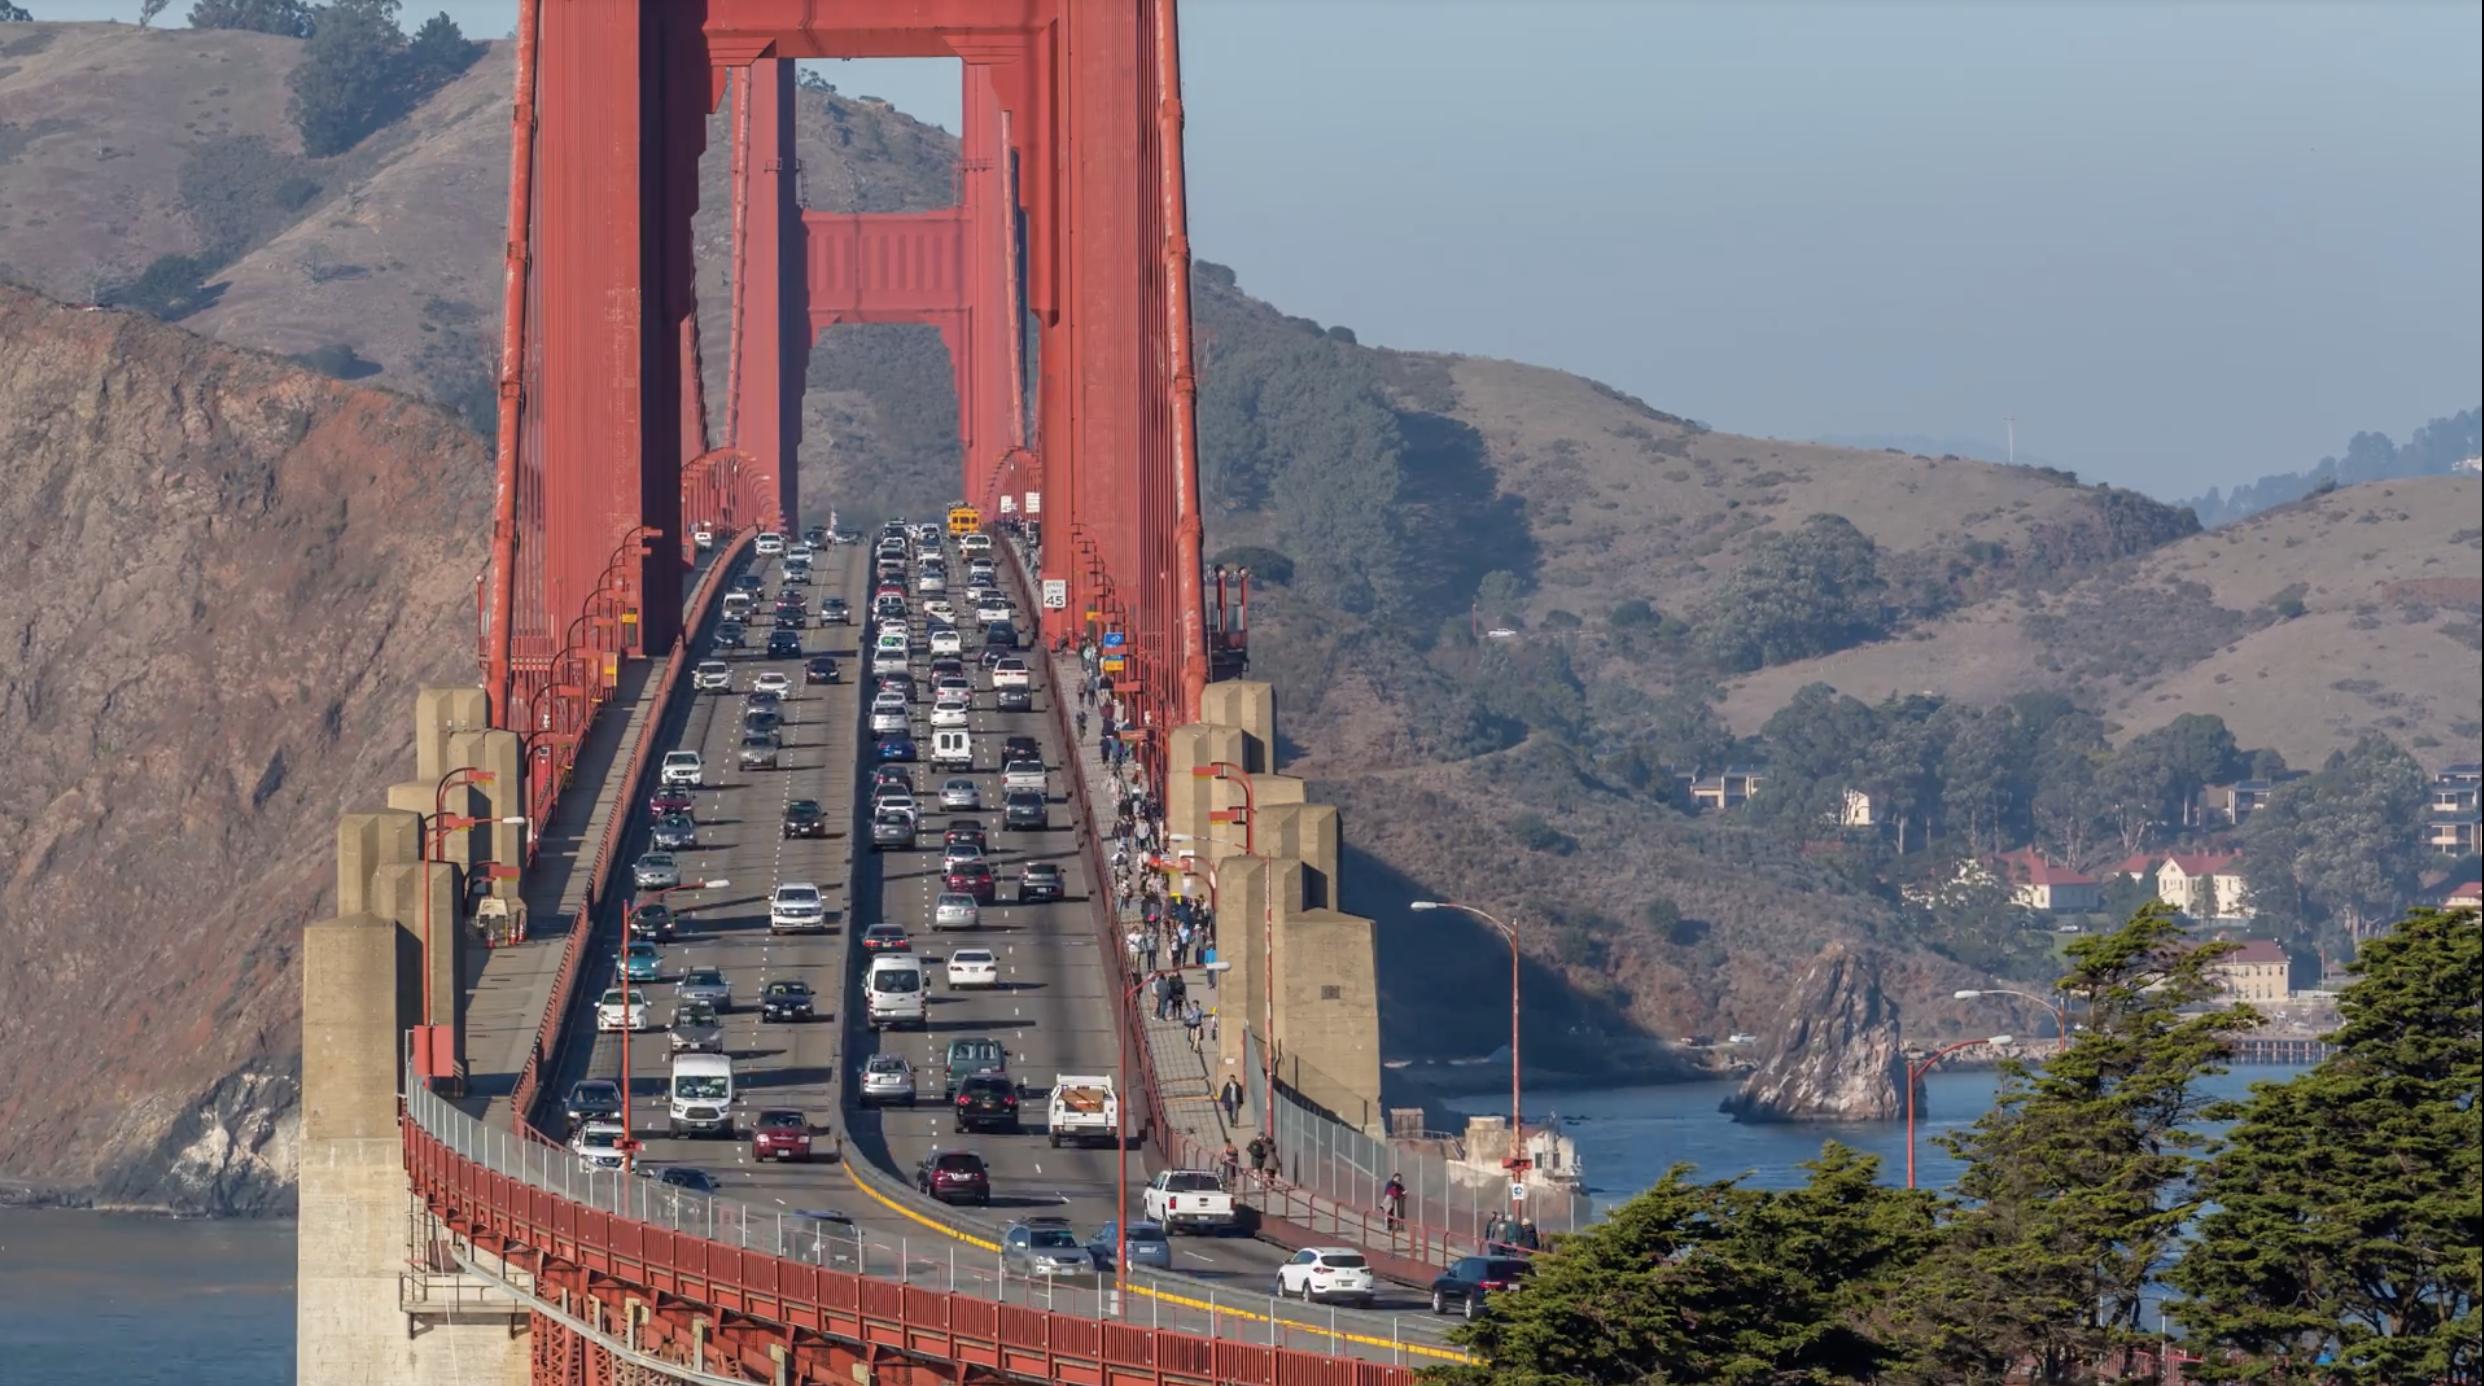 Hd San Francisco Golden Gate Bridge Traffic Emeric S Timelapse